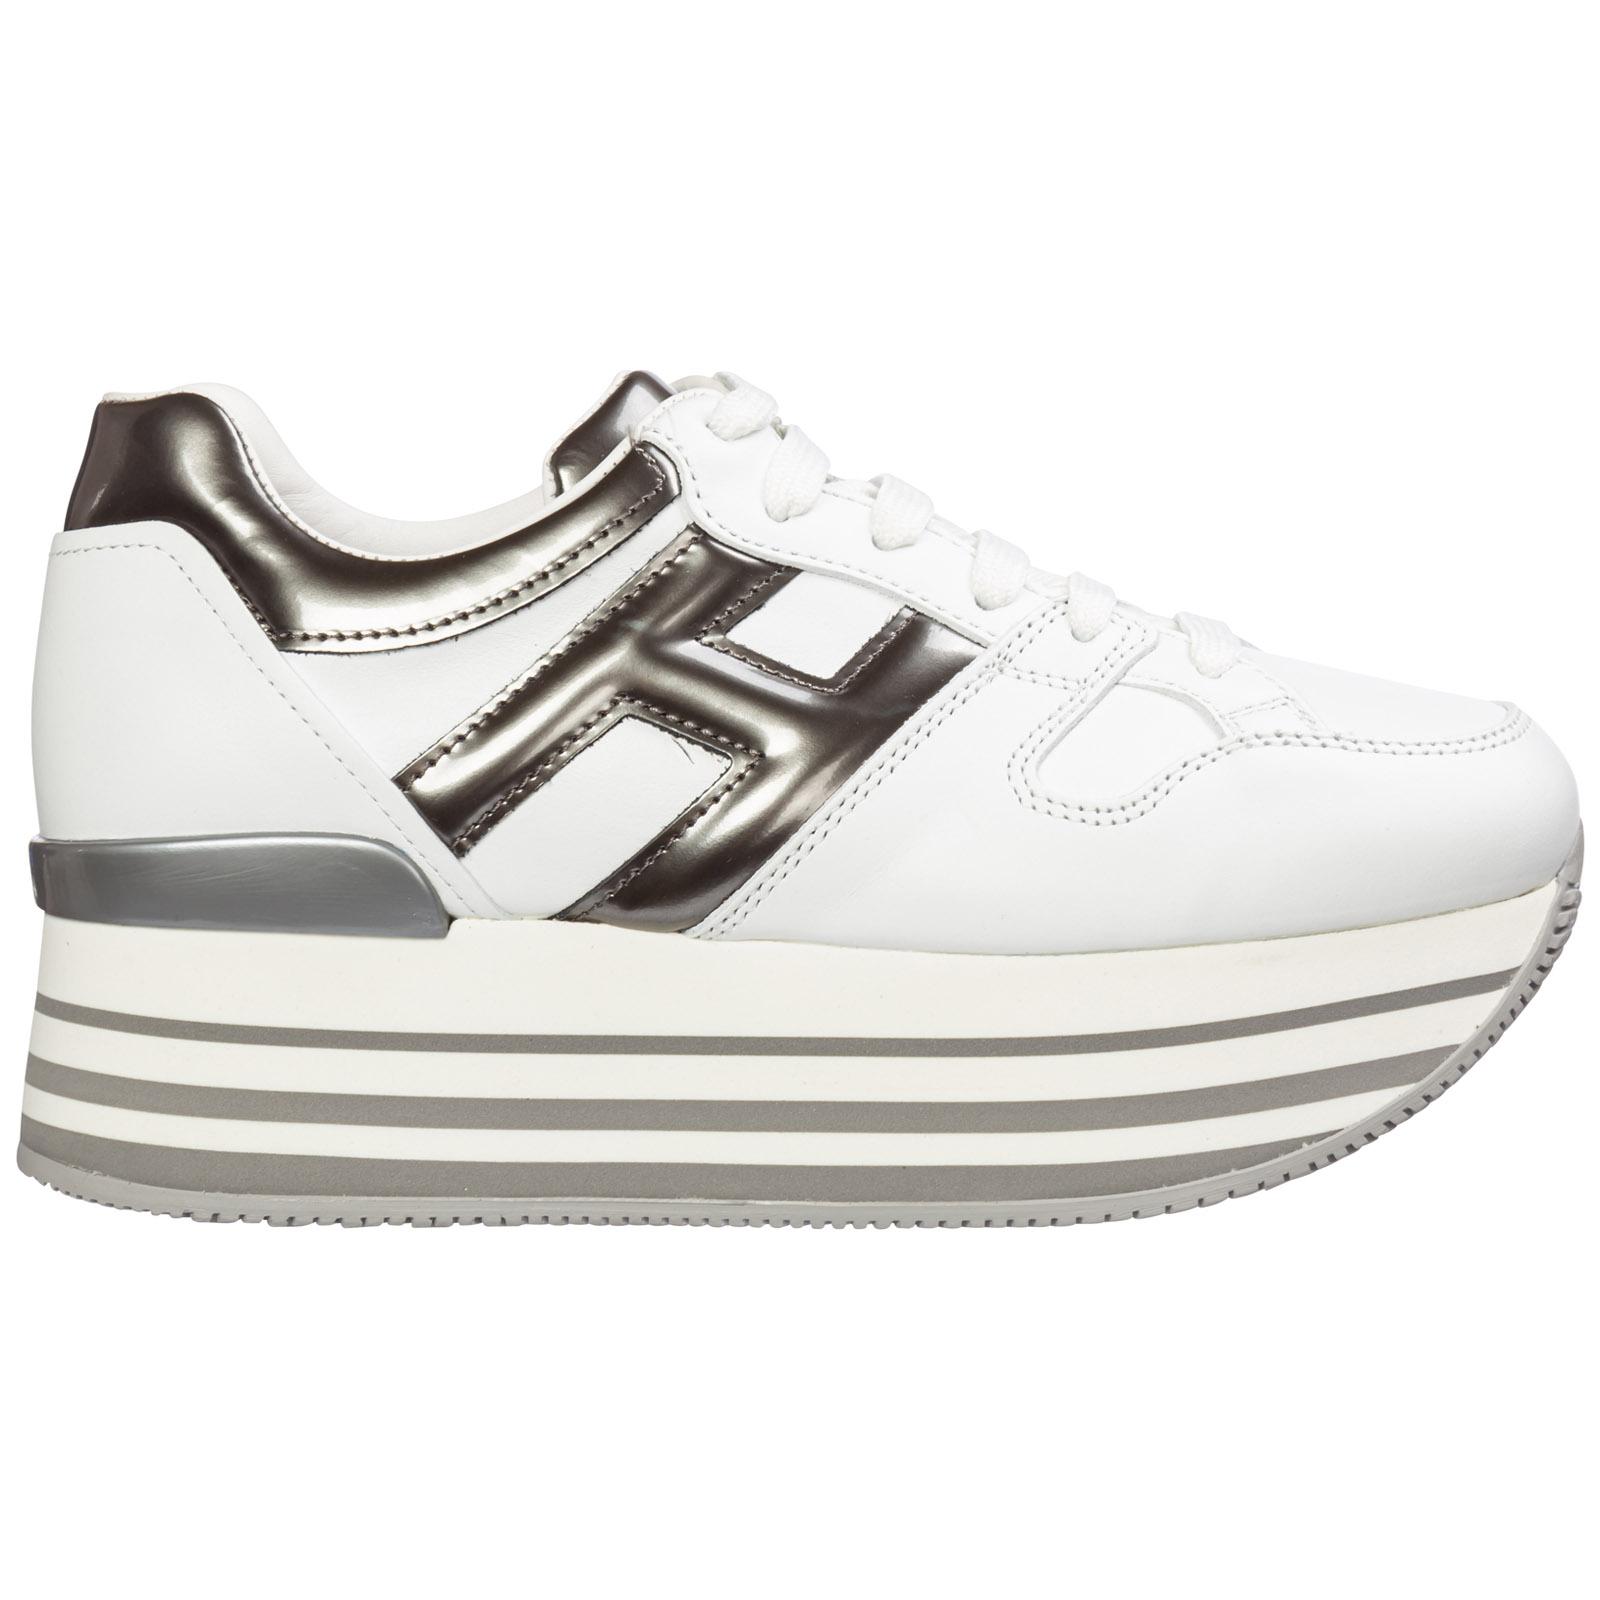 Wedge sneakers Hogan maxi h222